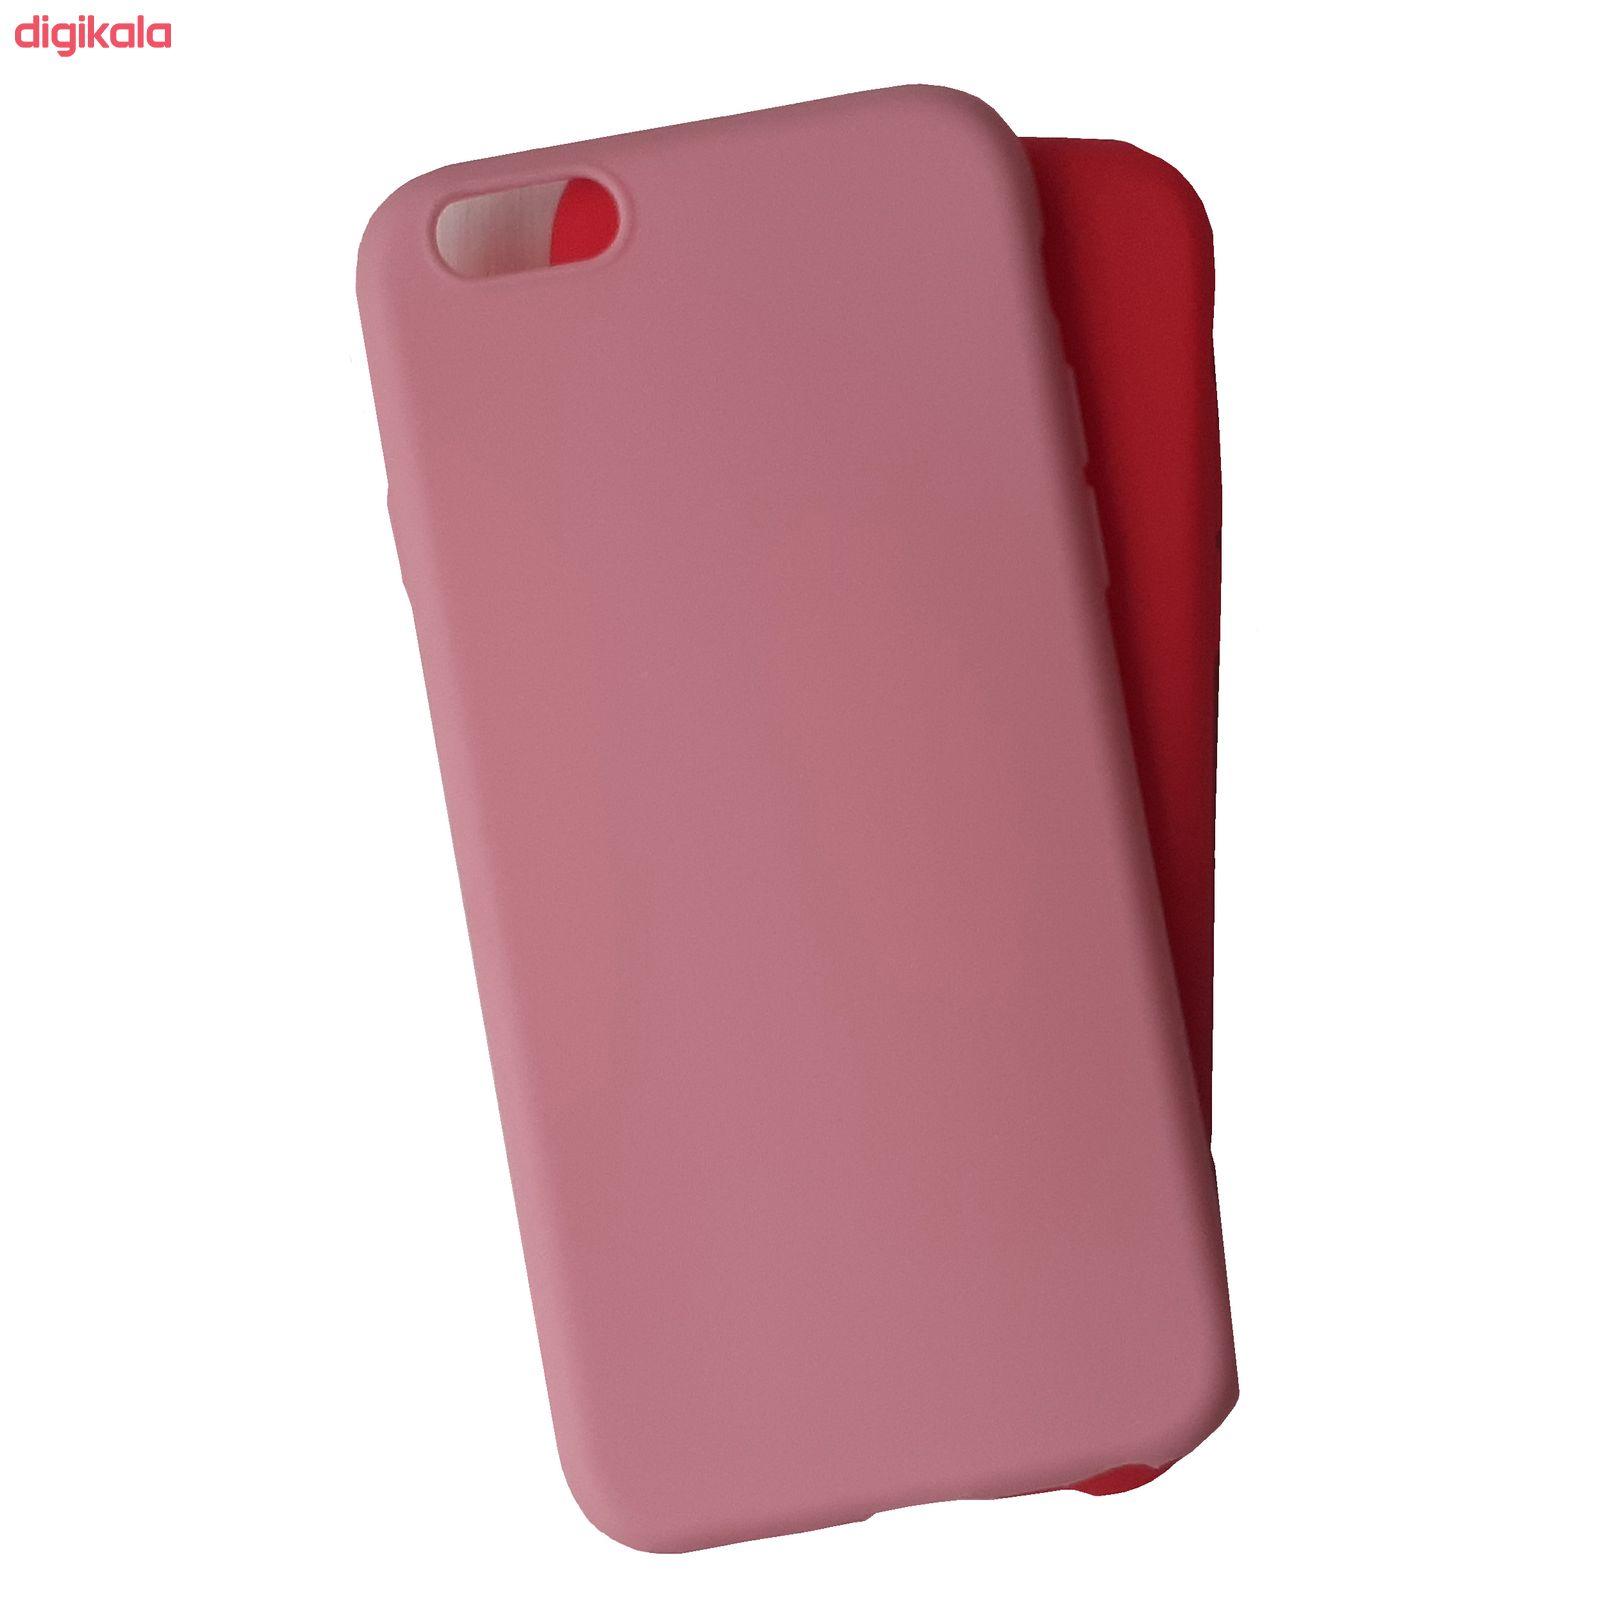 کاور مدل M-6G مناسب برای گوشی موبایل اپل iphone 6/6S main 1 4